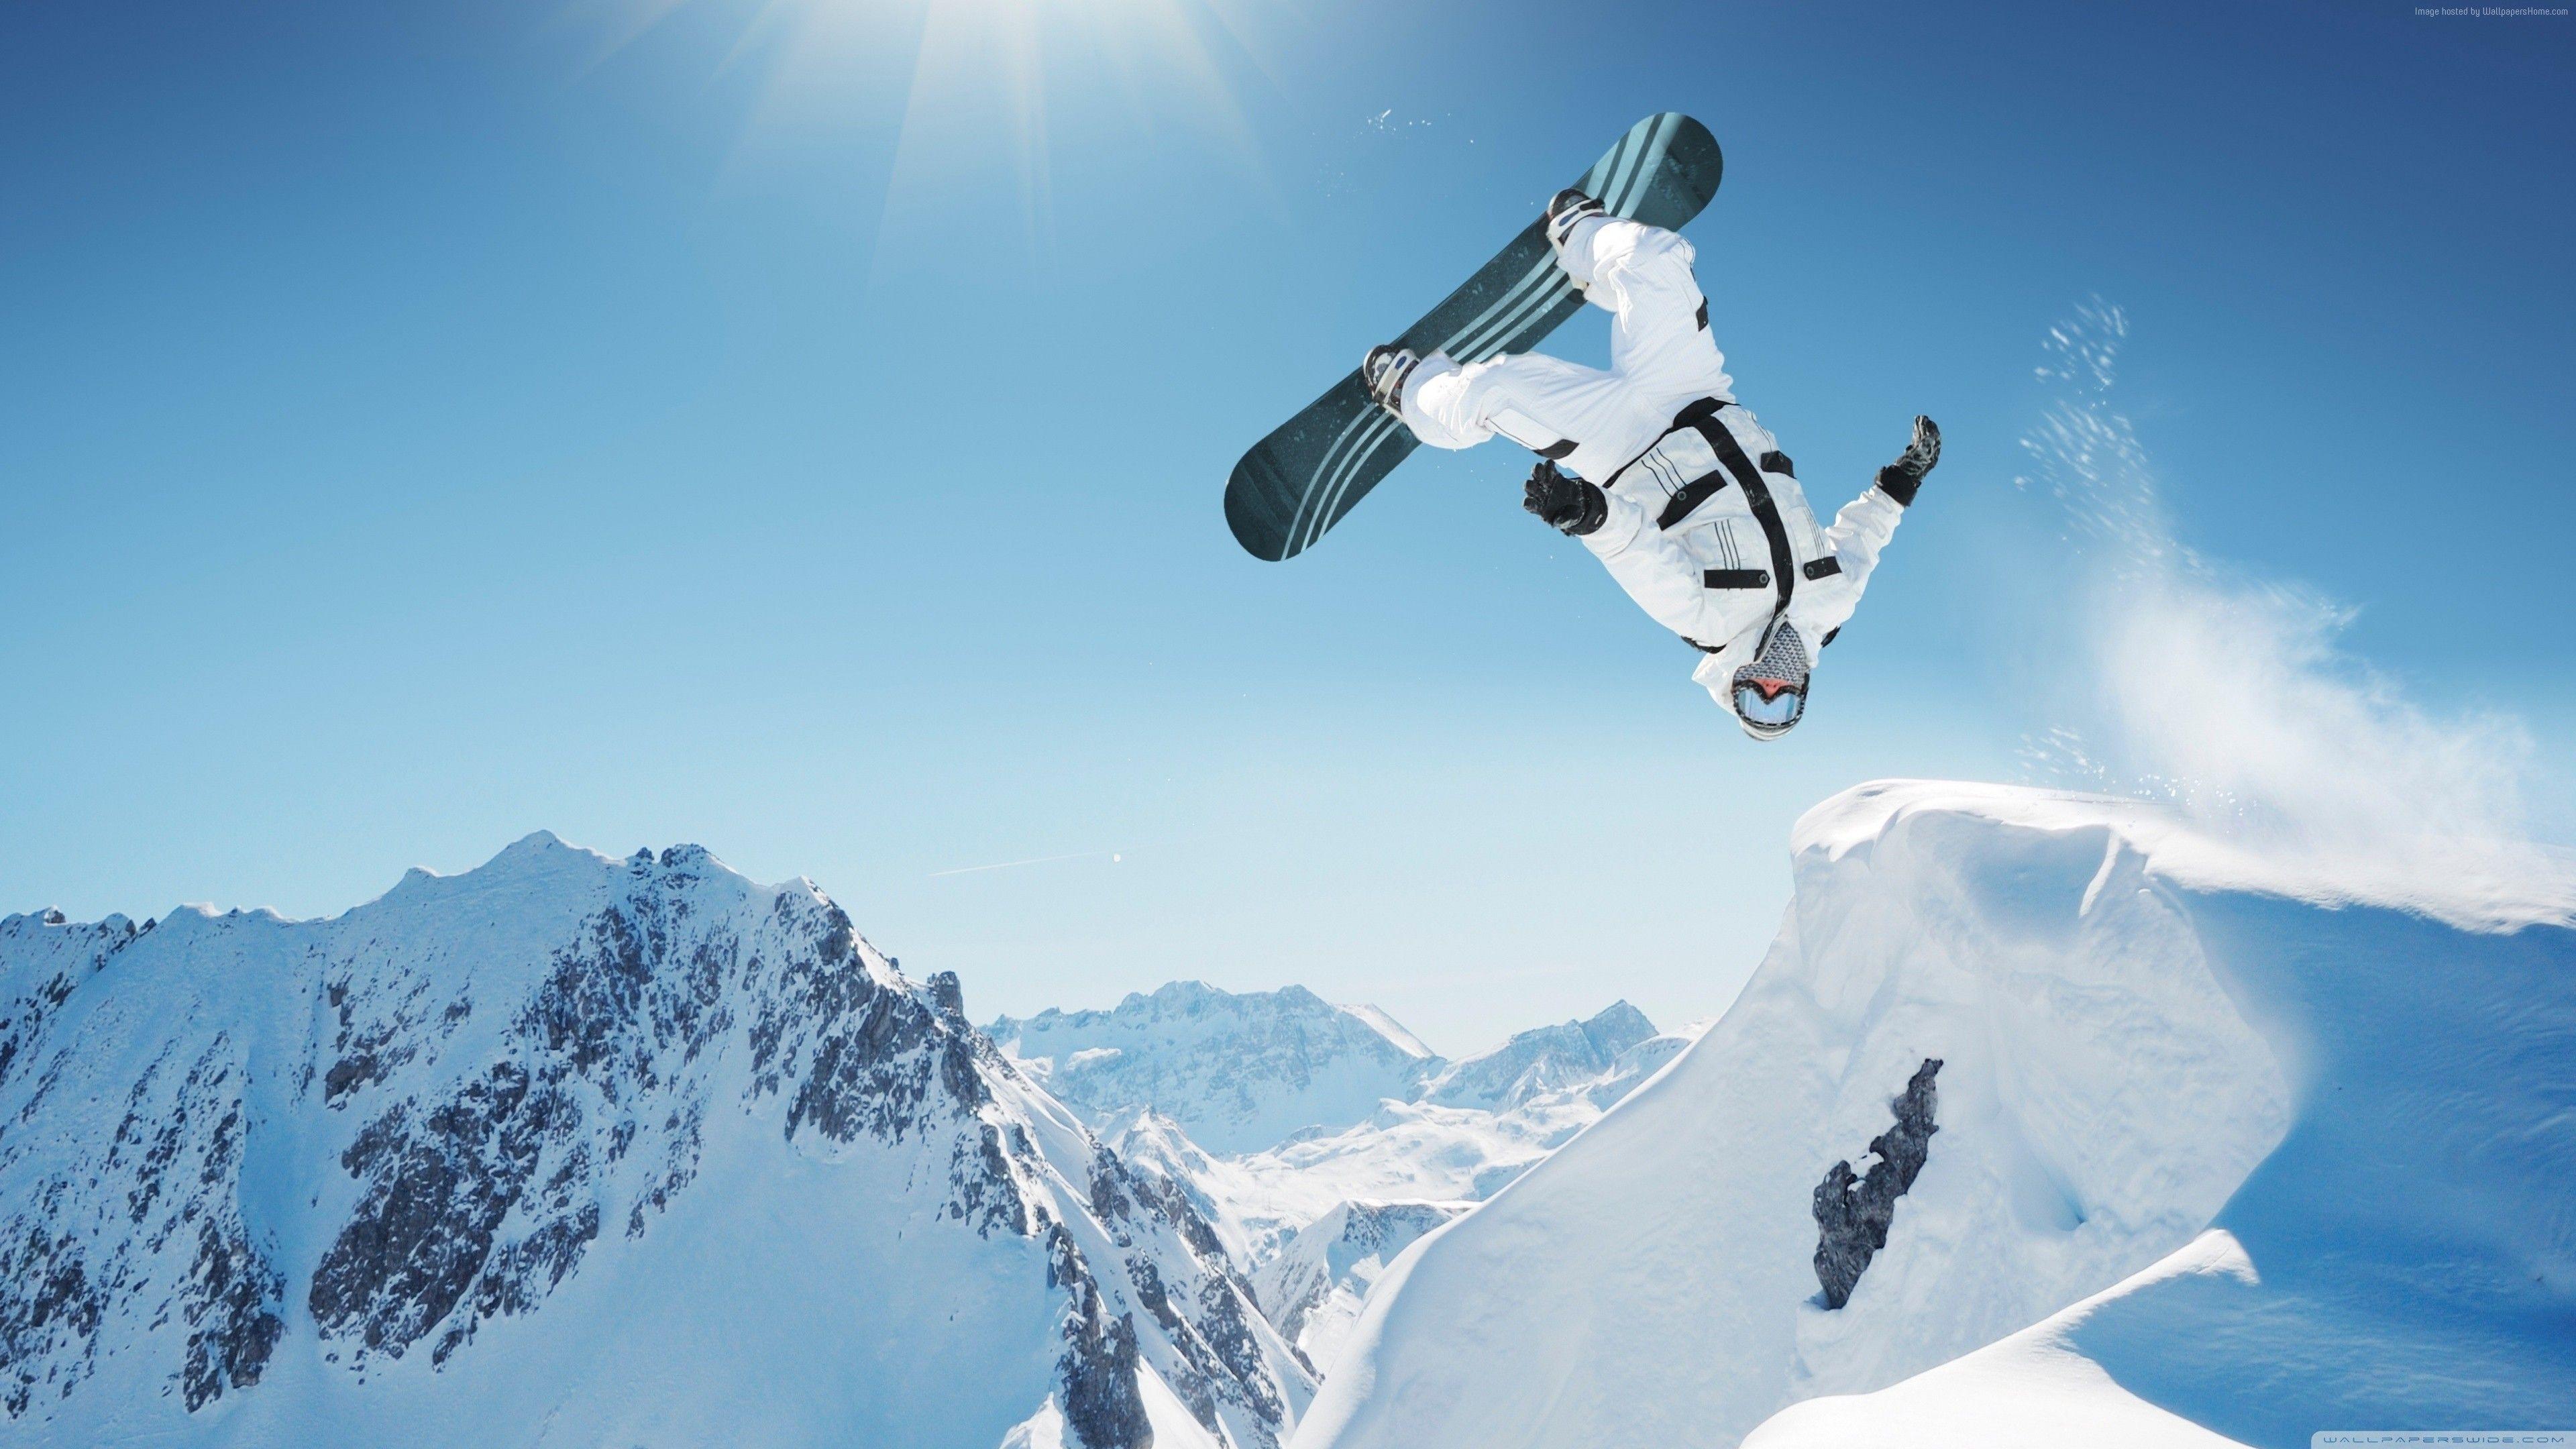 Wallpaper Extreme Snowboarding Winter Jump Snow Sport Https Www Pxwall Com Wallpaper Extreme Snowboarding Wi Snowboard Snowboarding Sports Wallpapers